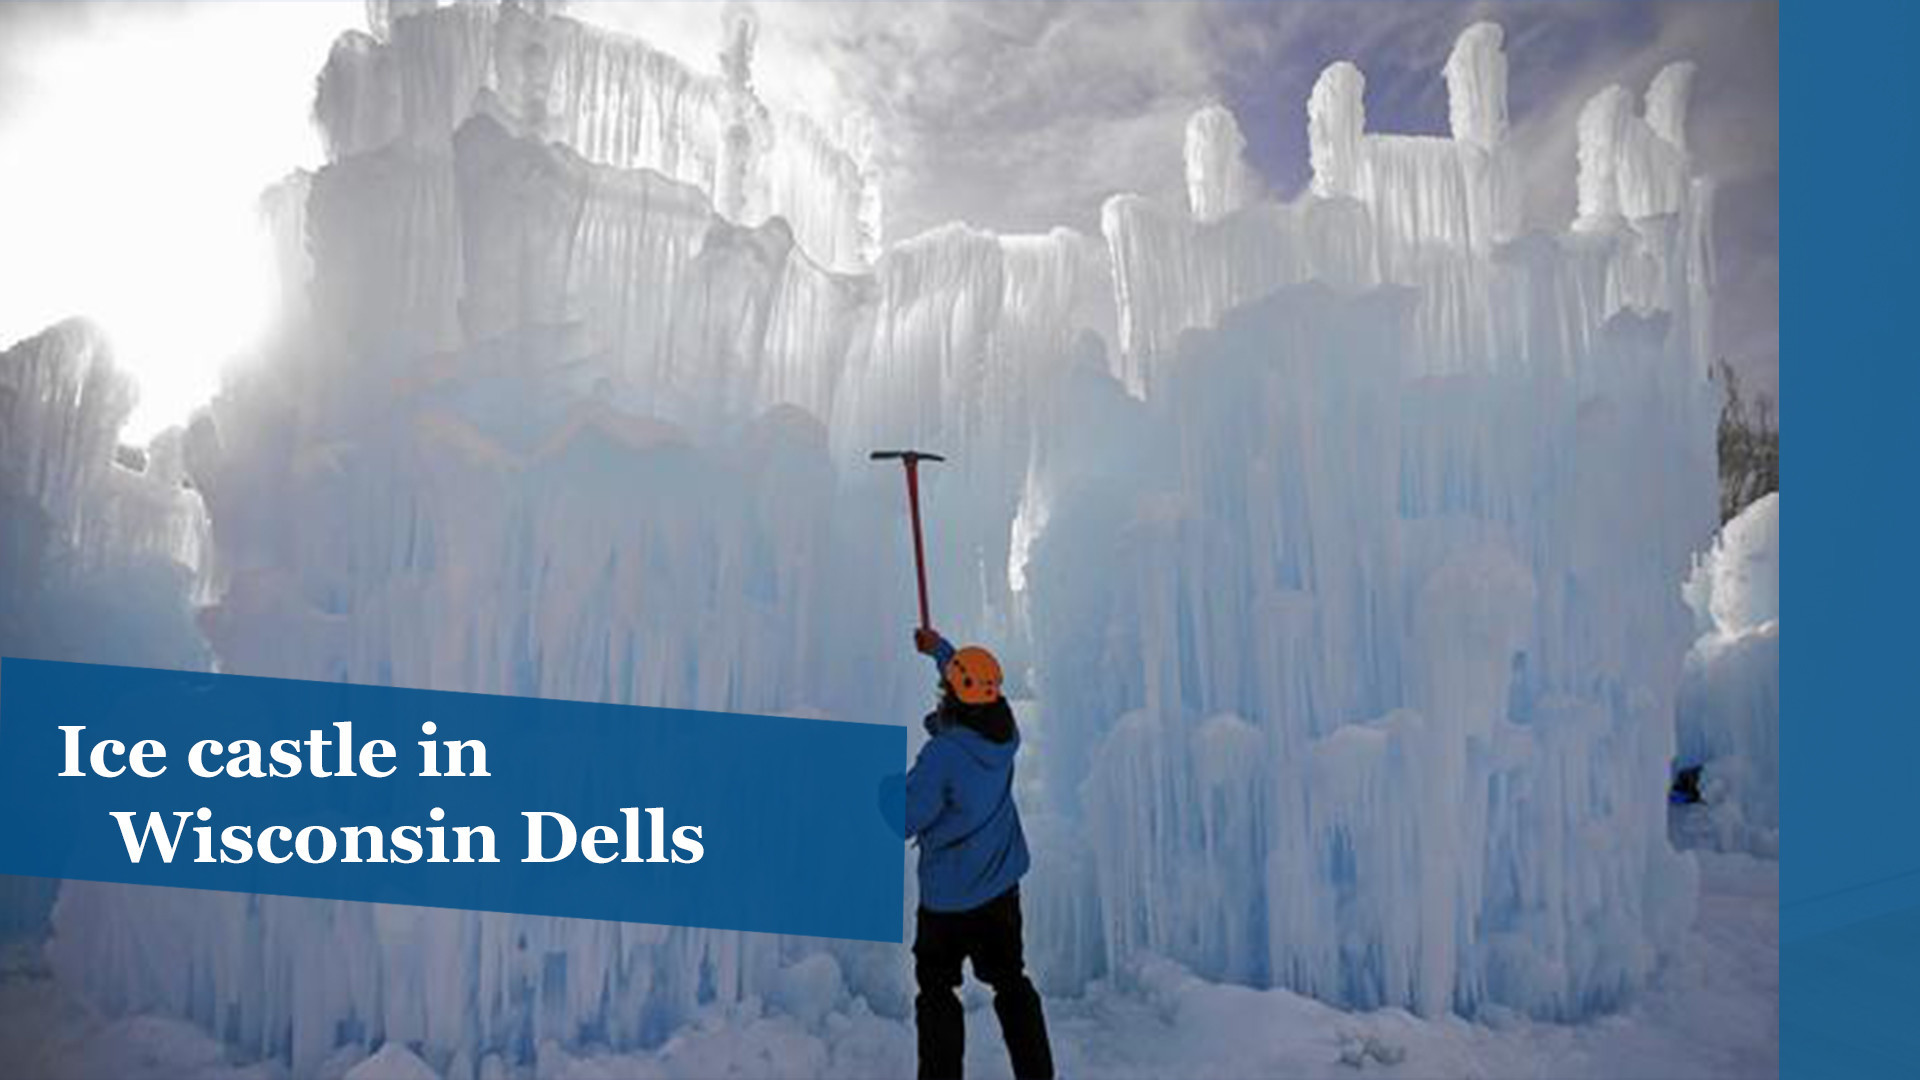 wisconsin dells ice castle